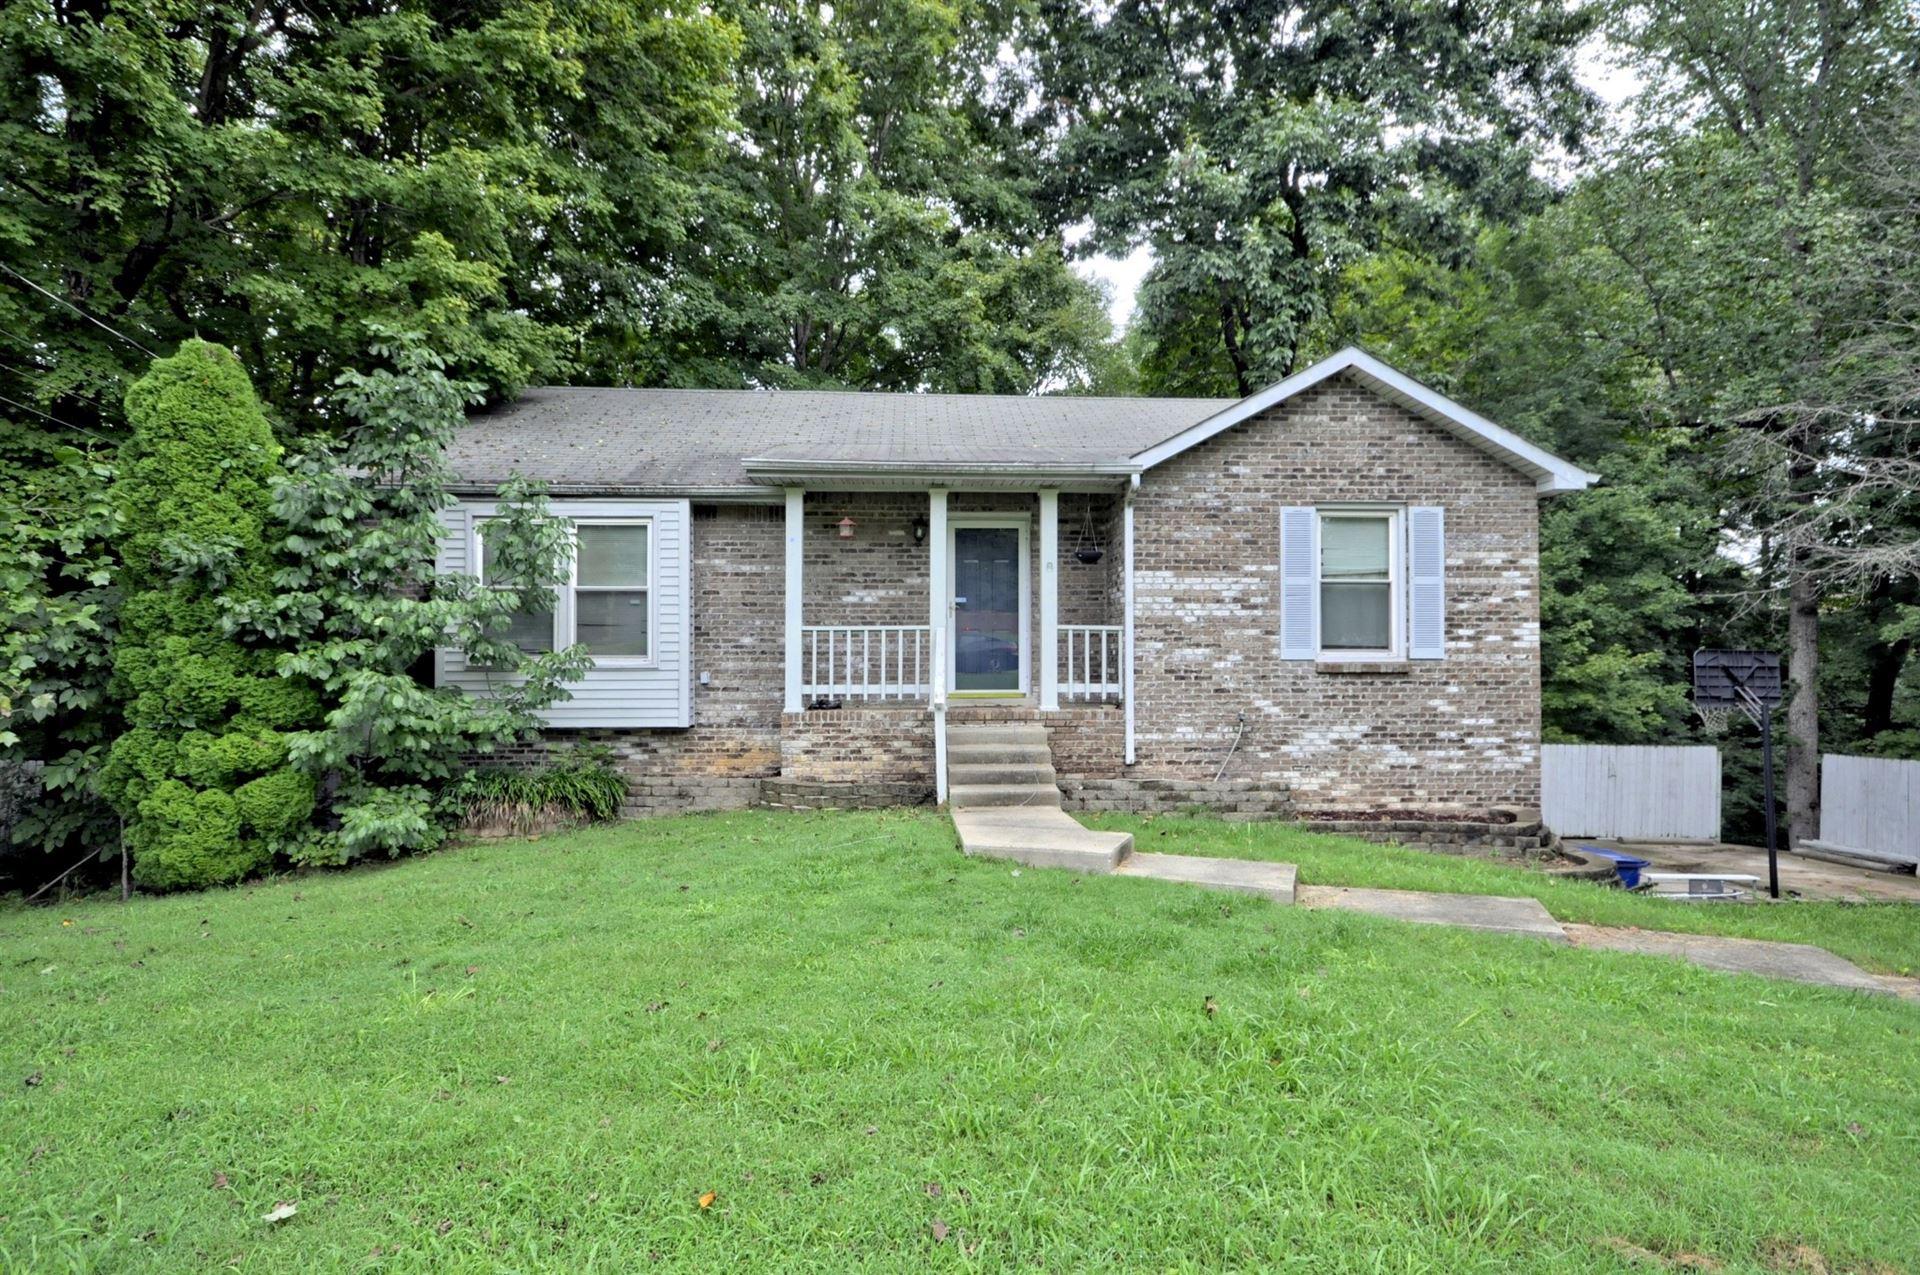 1719 Setter Rd, Clarksville, TN 37042 - MLS#: 2290623